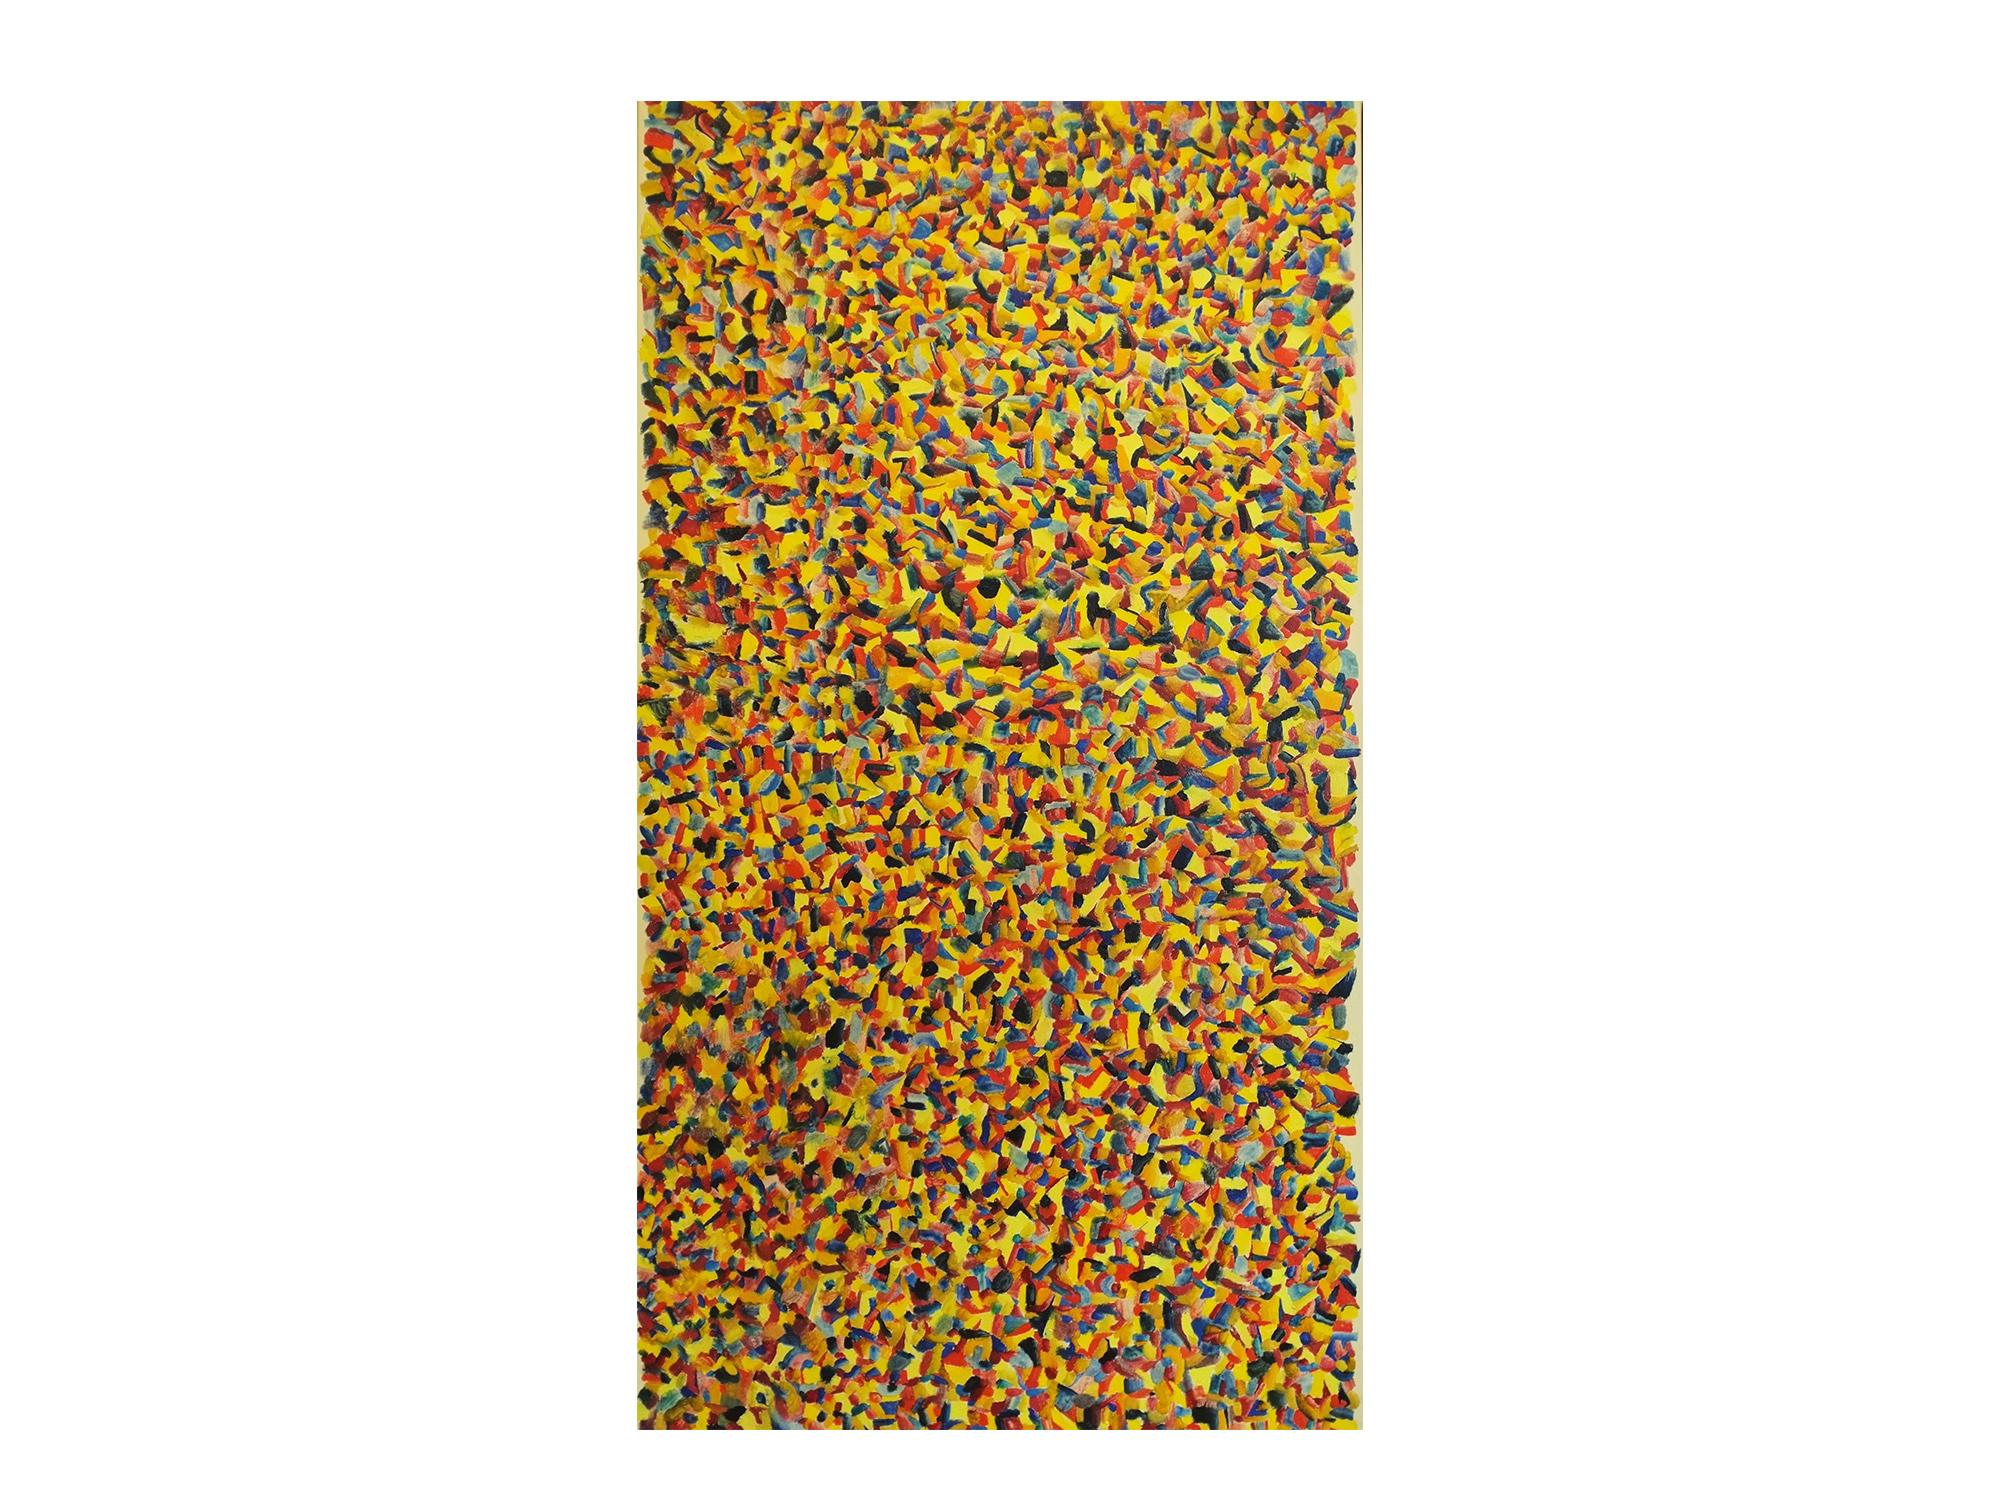 what   Women and trees,  2018 oil on linen 144.5 x 80.2cm   ARTIST BIO